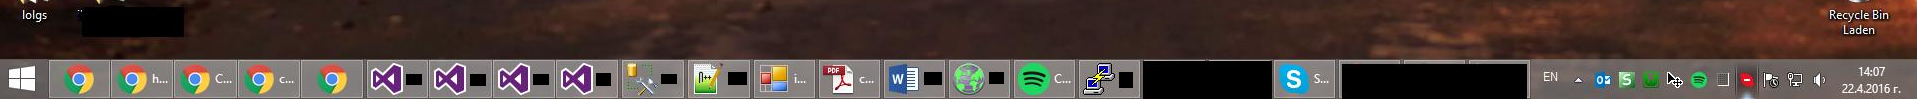 20160422desktop